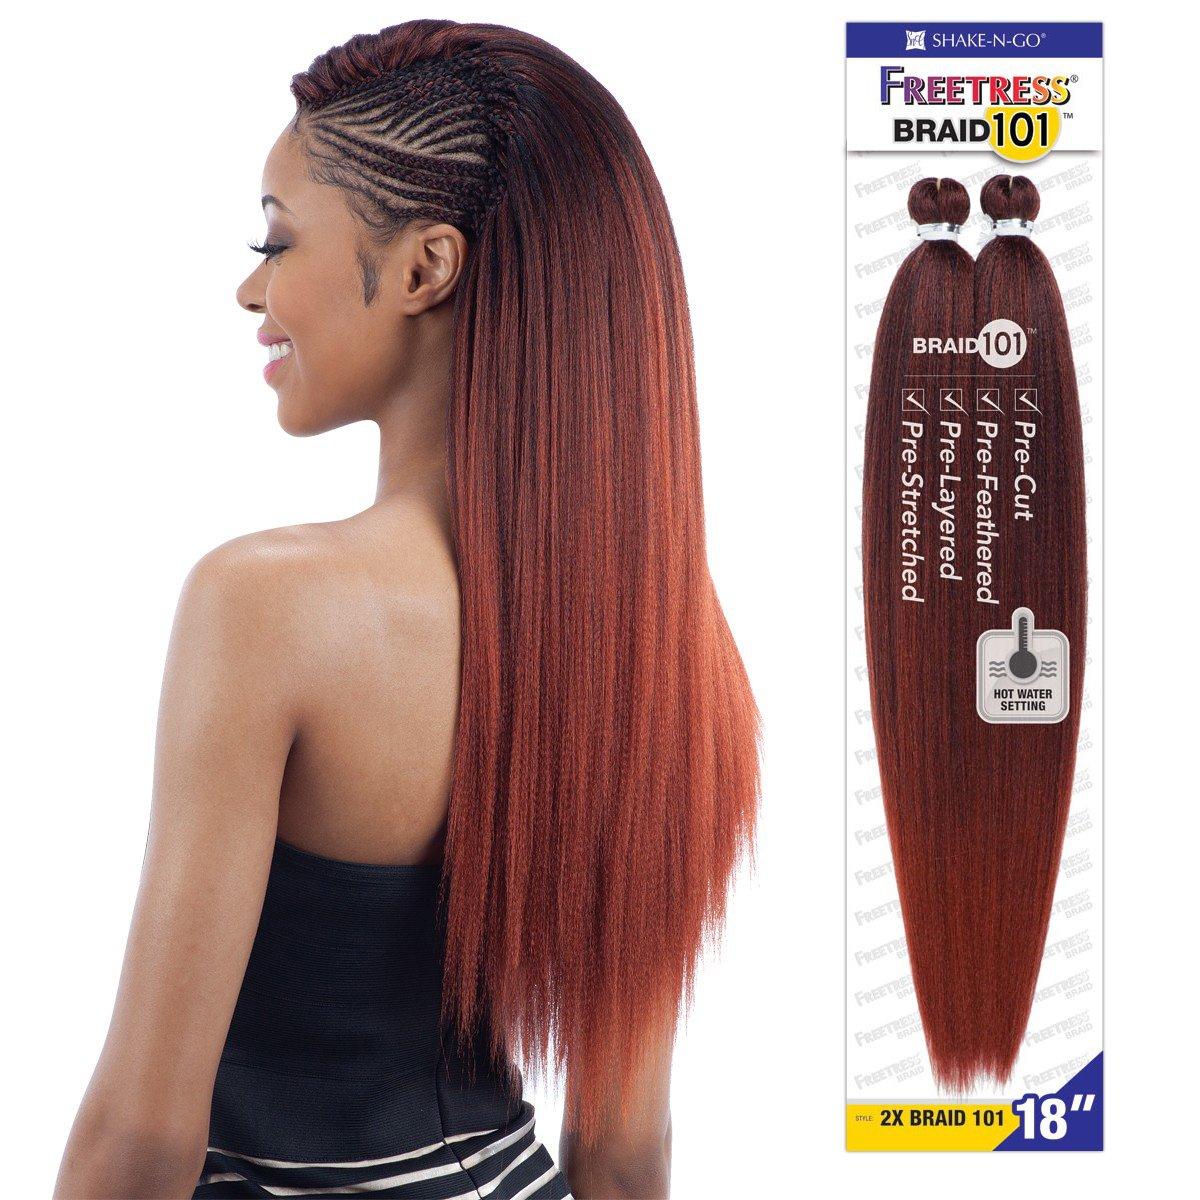 Amazon 2x Braid 101 18 T30 Freetress Synthetic Hair Jumbo